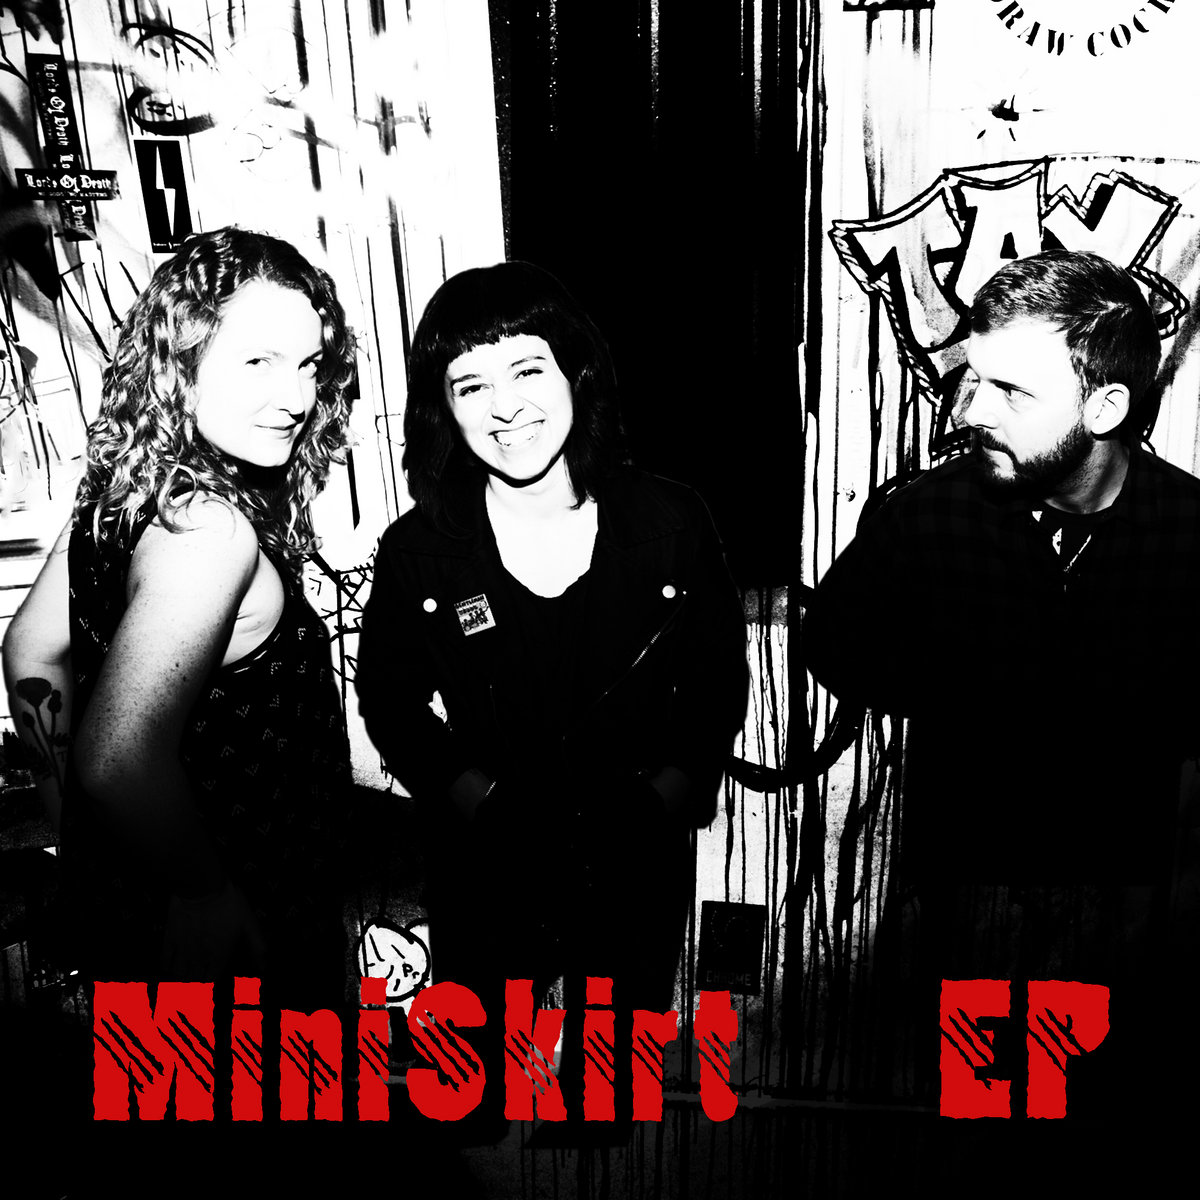 upskirt-punk-emo-indie-girls